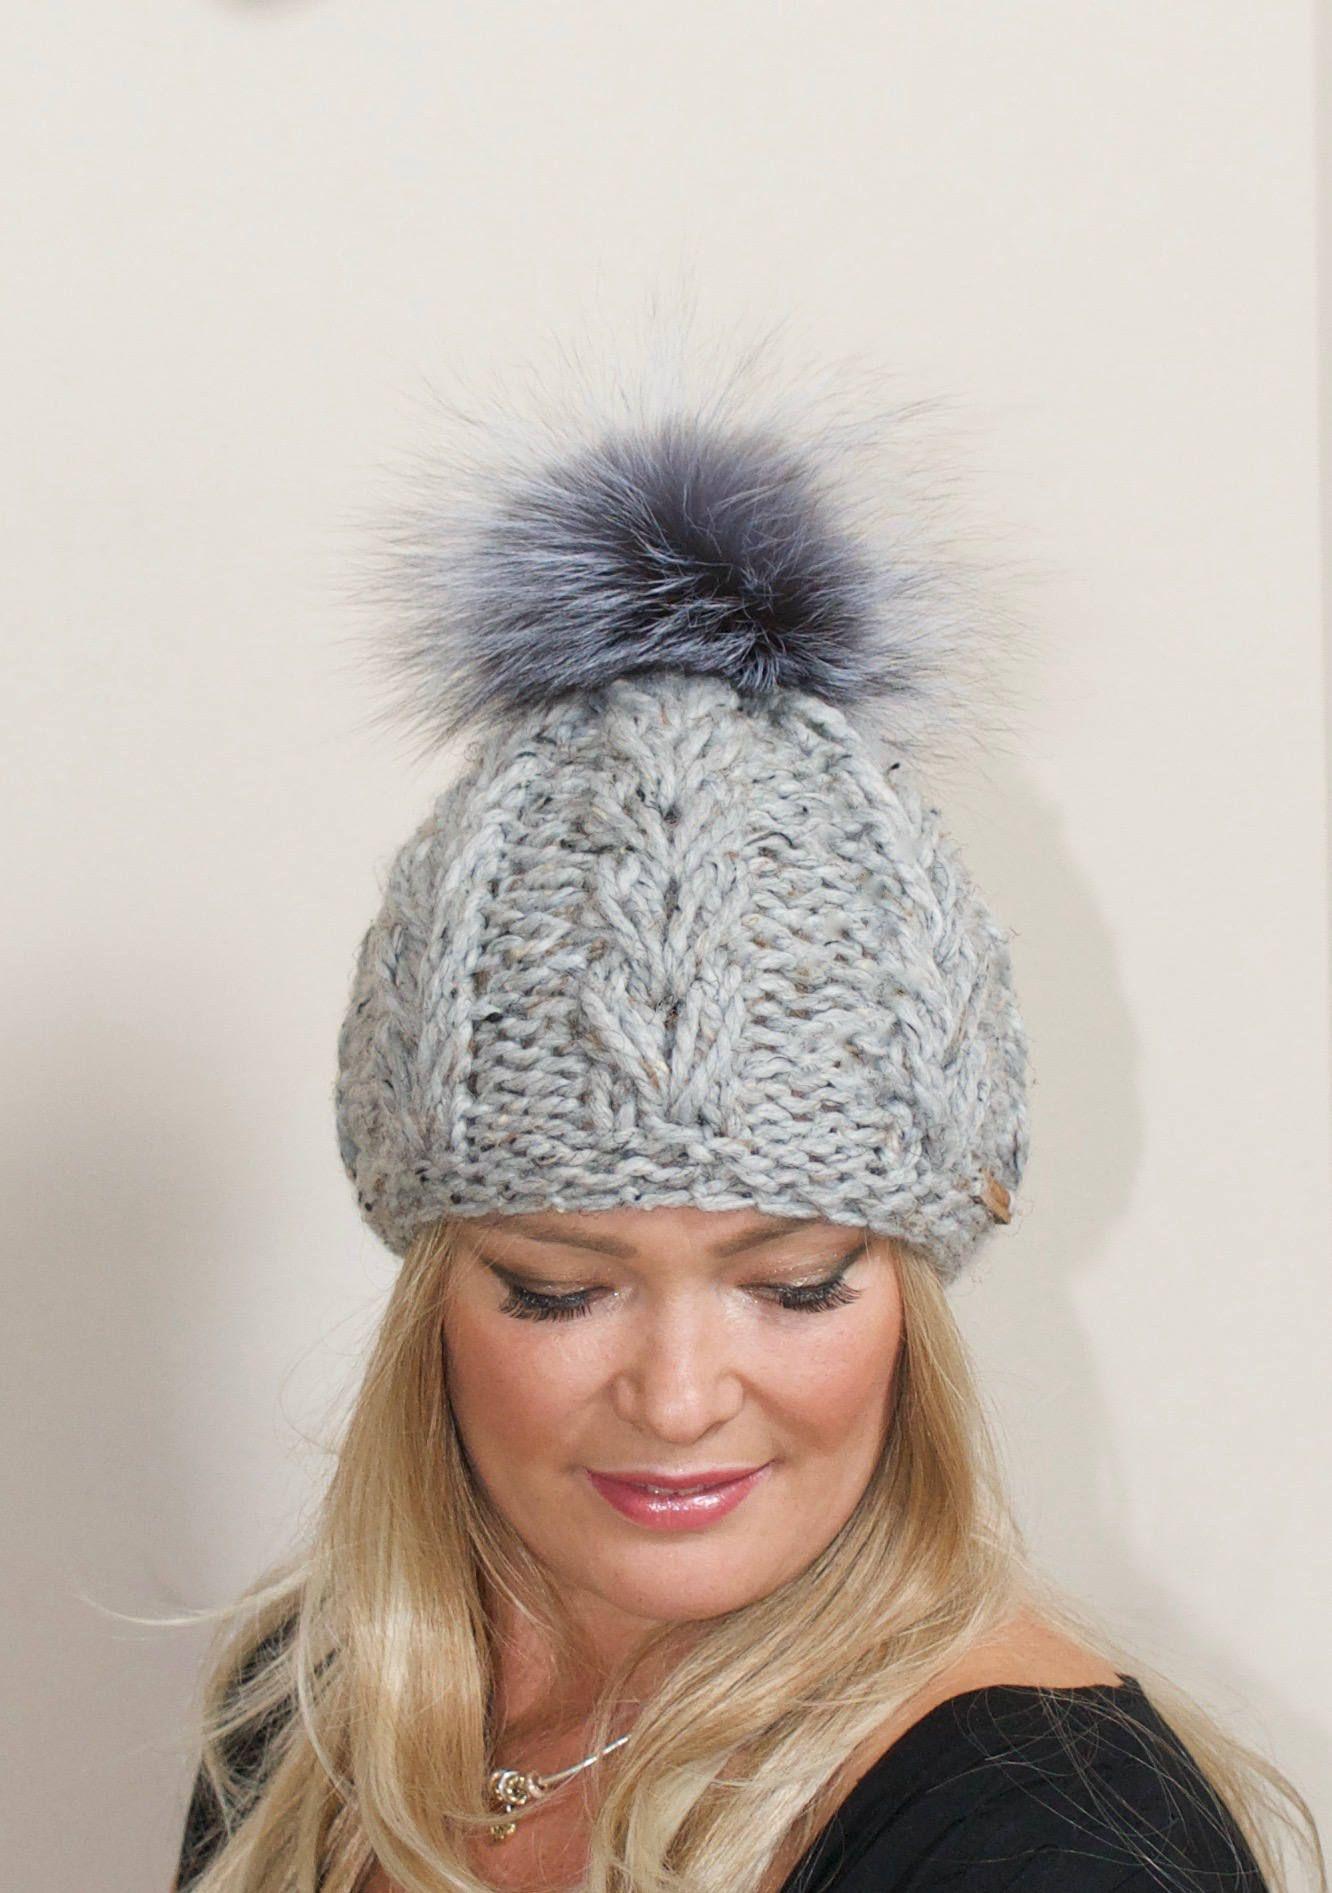 98e7be4452d Bobble Beanie Fur Pom Pom Hat Fur Pompom Beanie SALE Ski Hat Women CHOOSE  COLOR Cabled Hat Fox Fur Pom Pom Christmas Gift under 100 by lucymir on Etsy